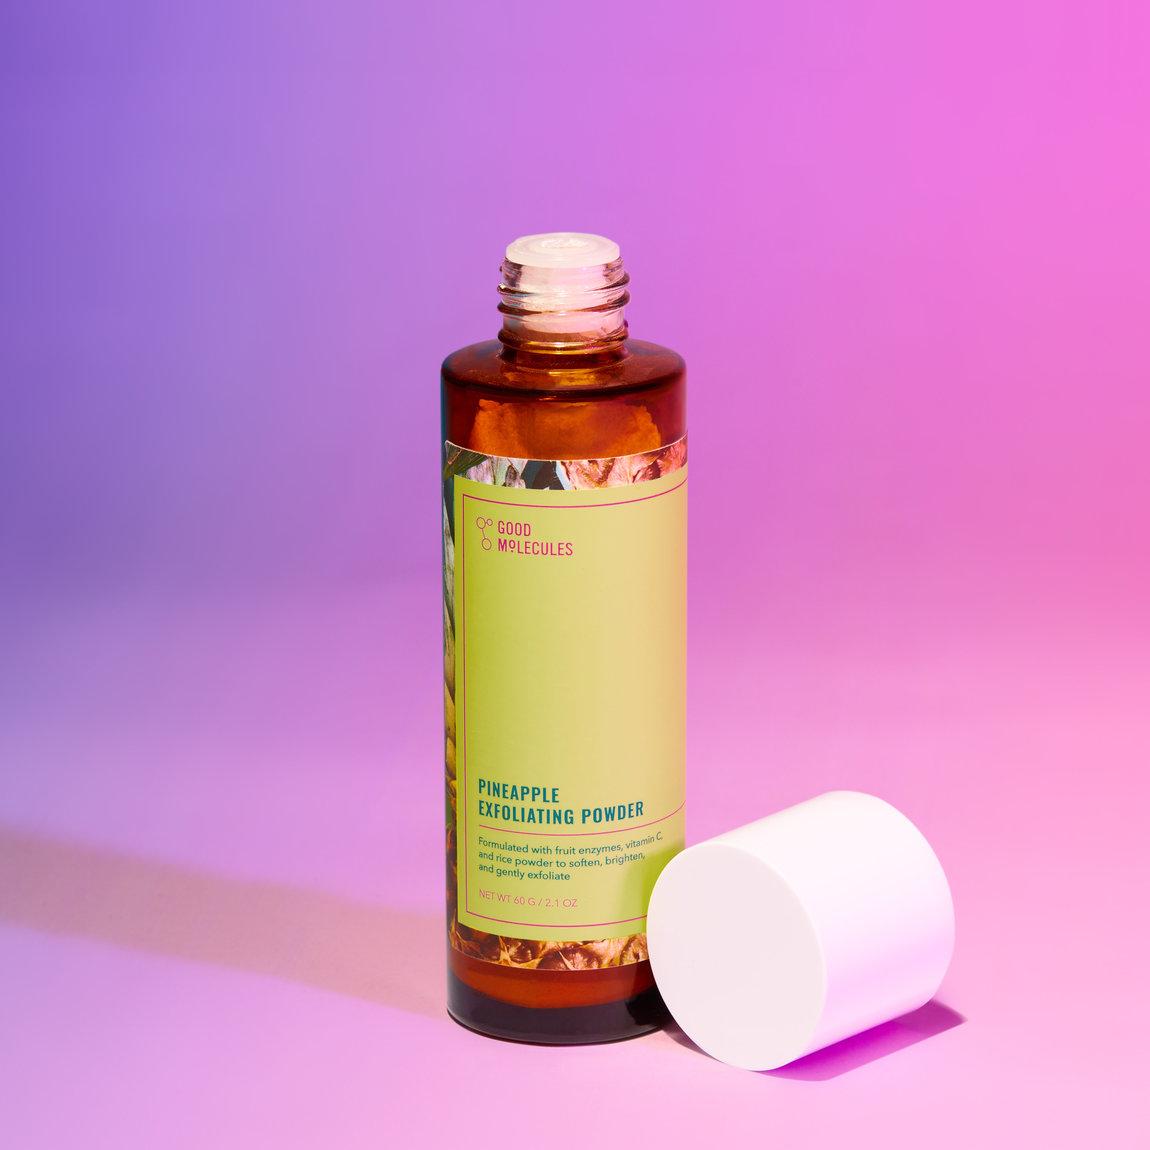 Good Molecules Pineapple Exfoliating Powder Single